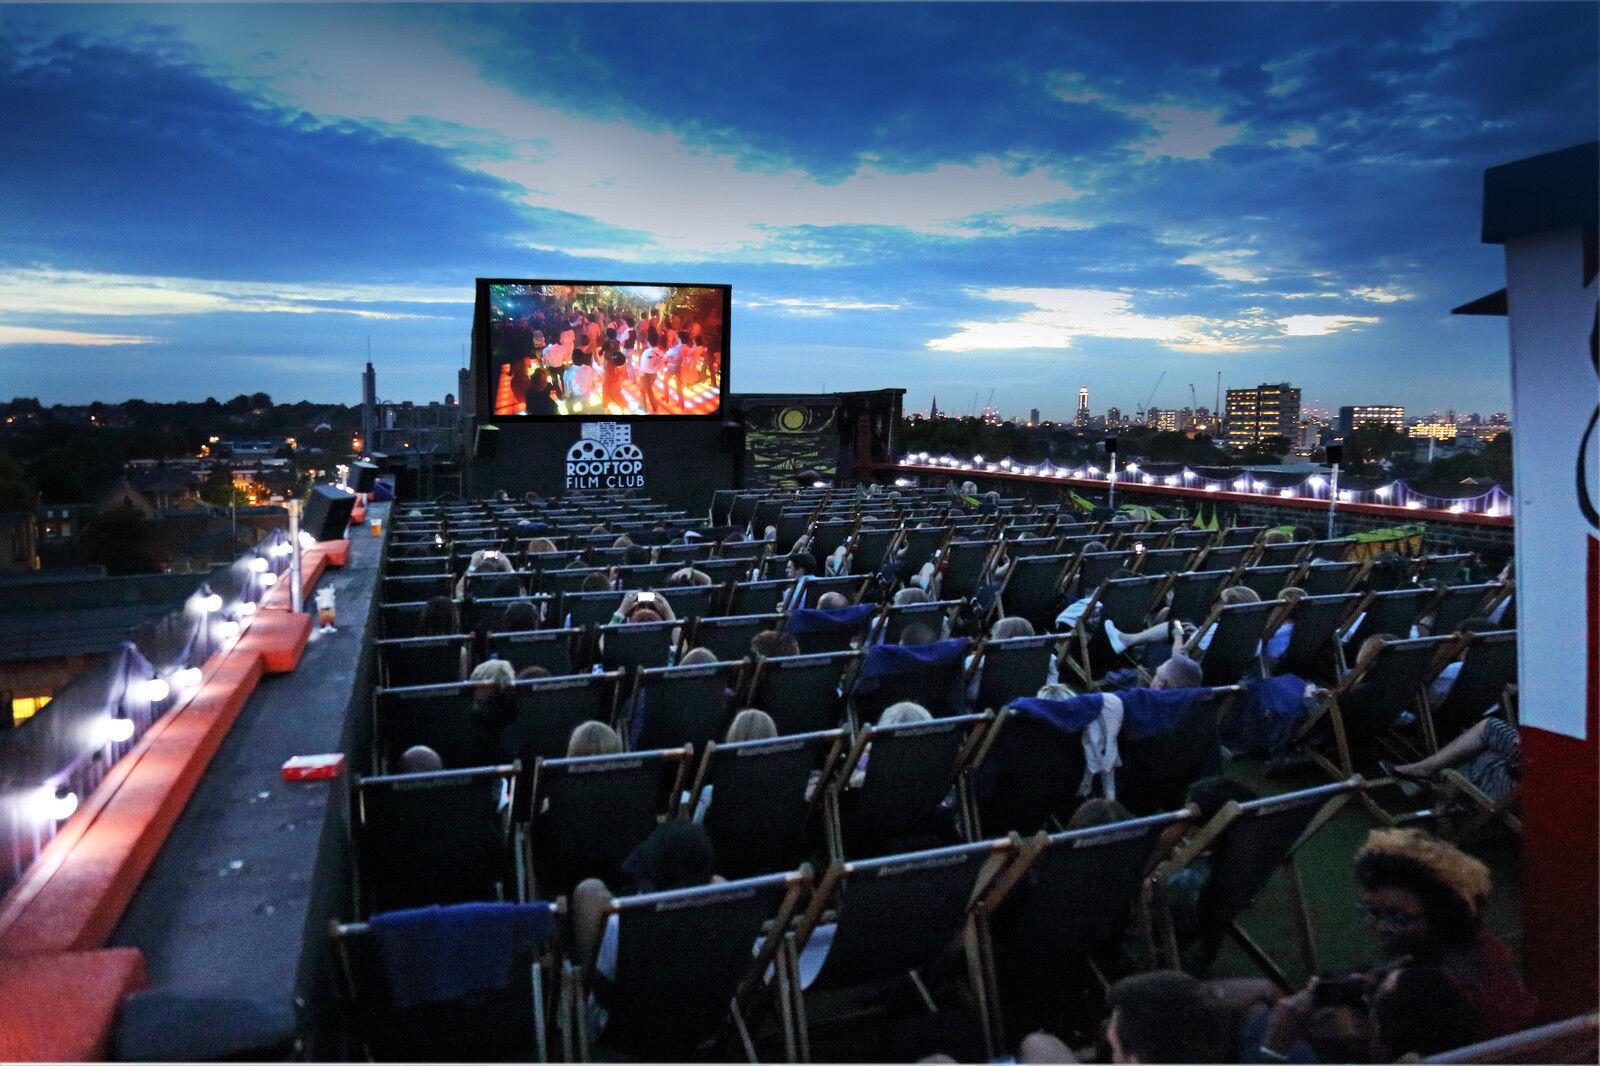 Rooftop Cinema Tickets 2014 Rooftop Cinema Tickets Tour